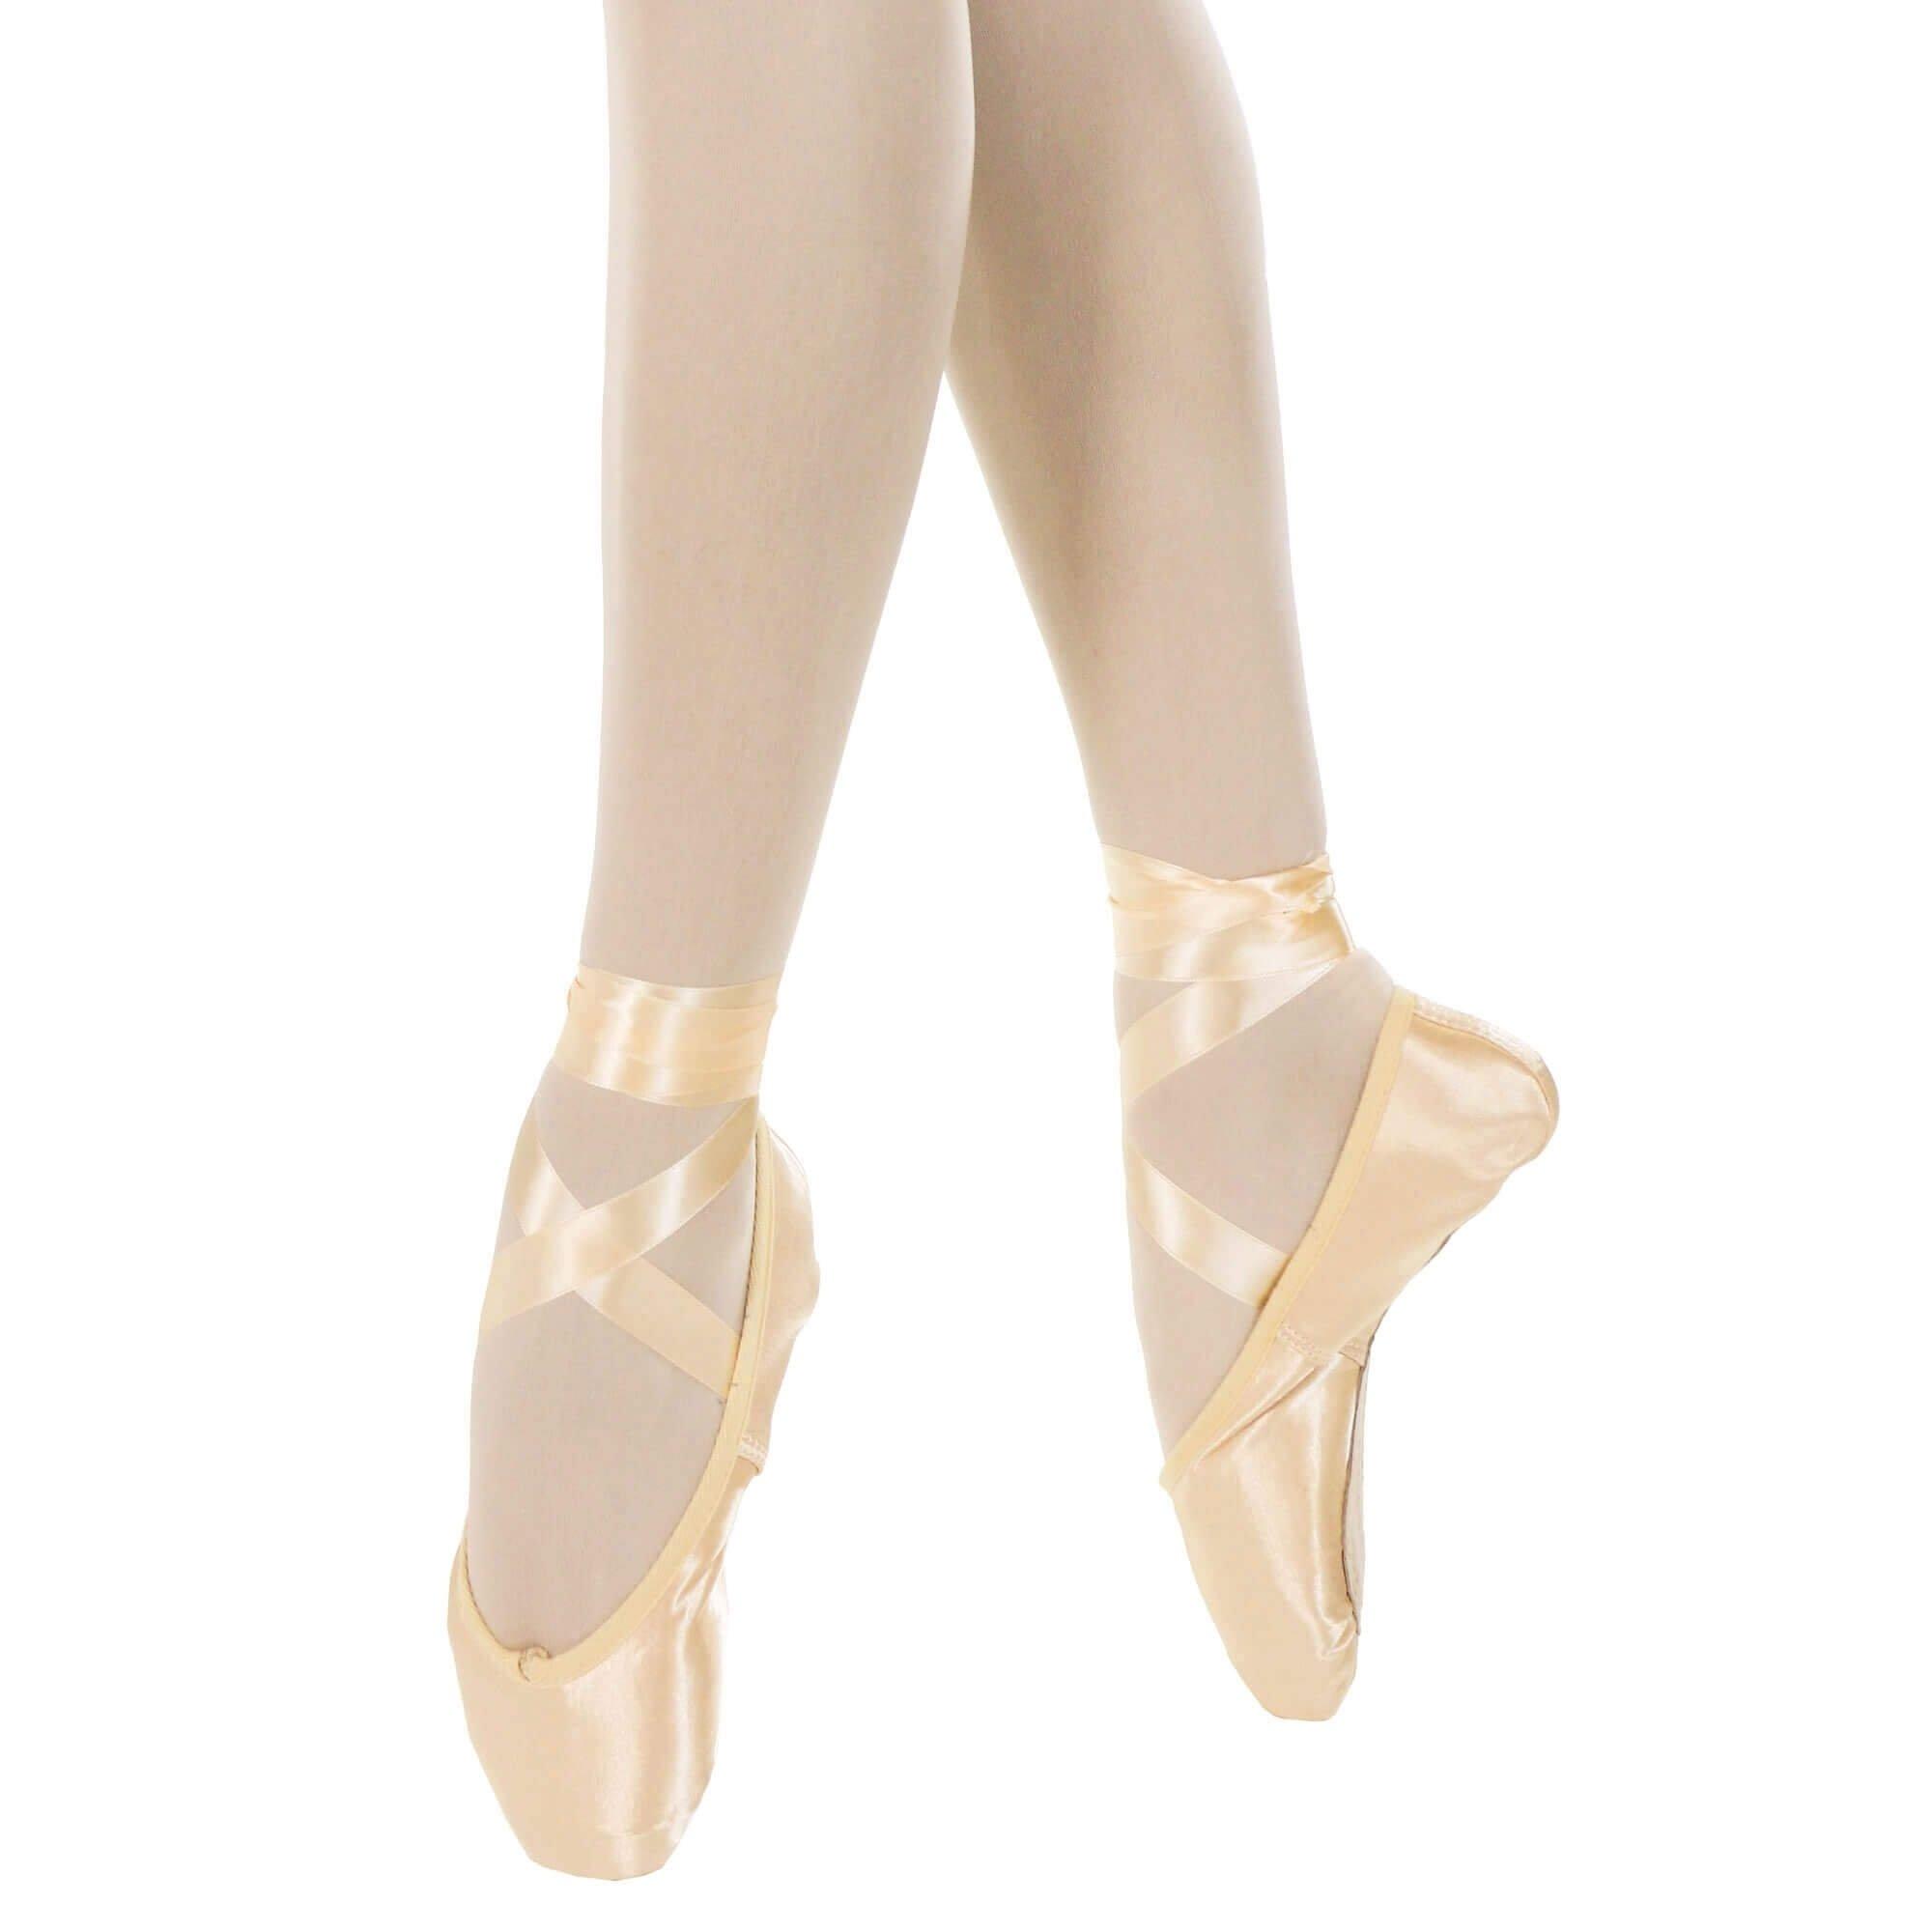 4db94f3c1eeb Danzcue Womens Standard Hard Shank Pointe Shoes With Ribbon